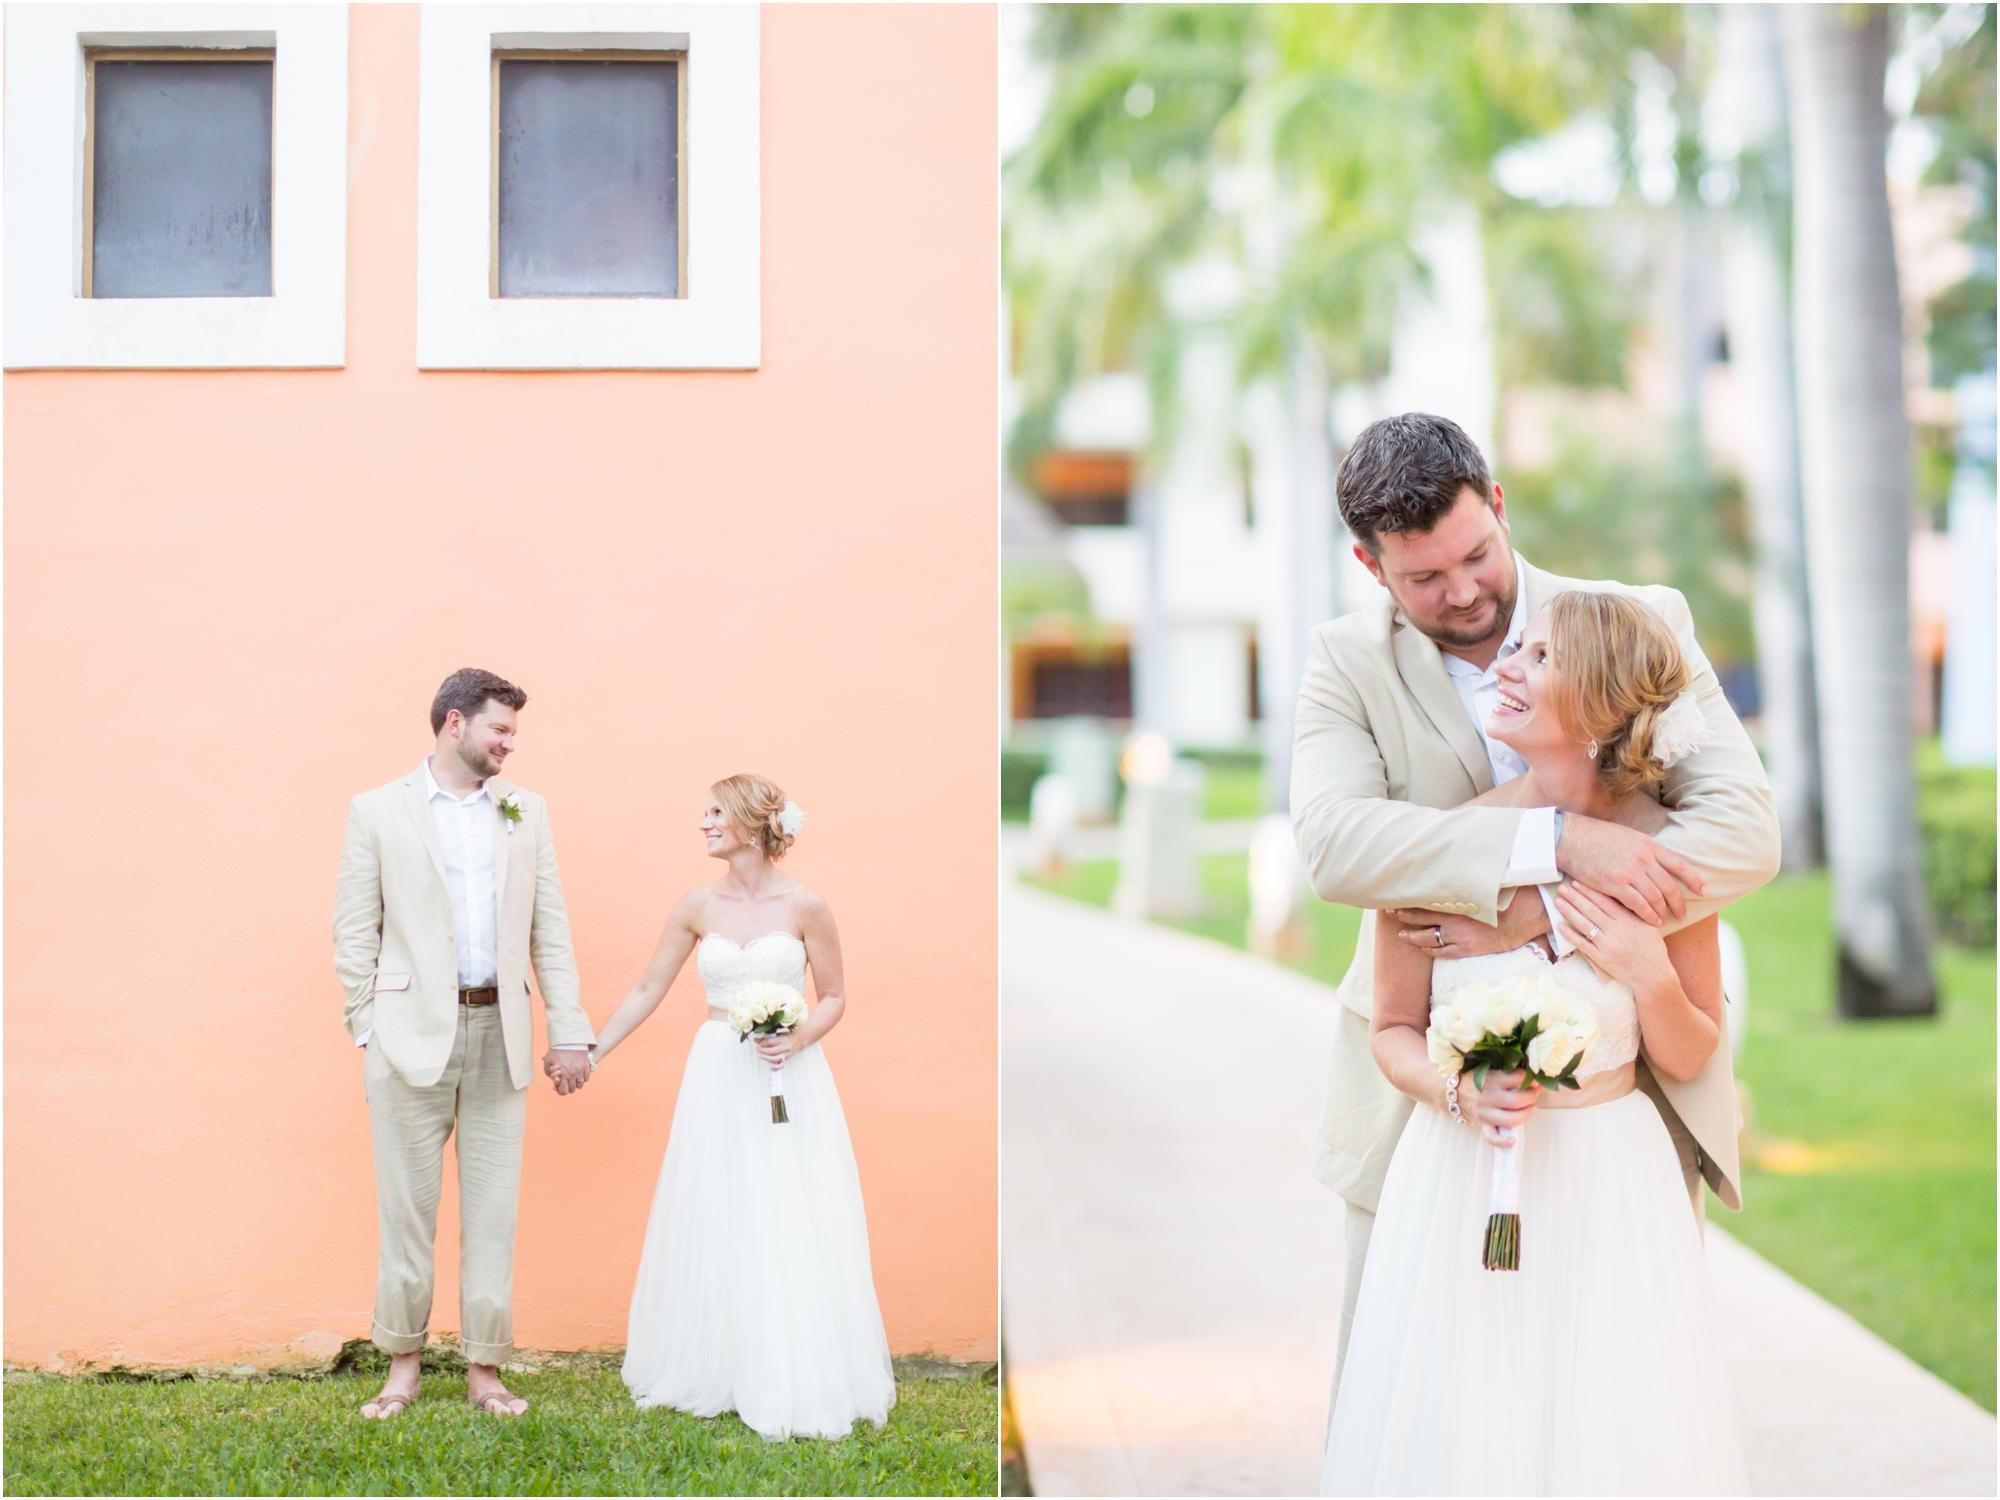 Morosoff Wedding 4-Bride & Groom Portraits-543_anna grace photography destination wedding photographer playa del carmen mexico photo.jpg